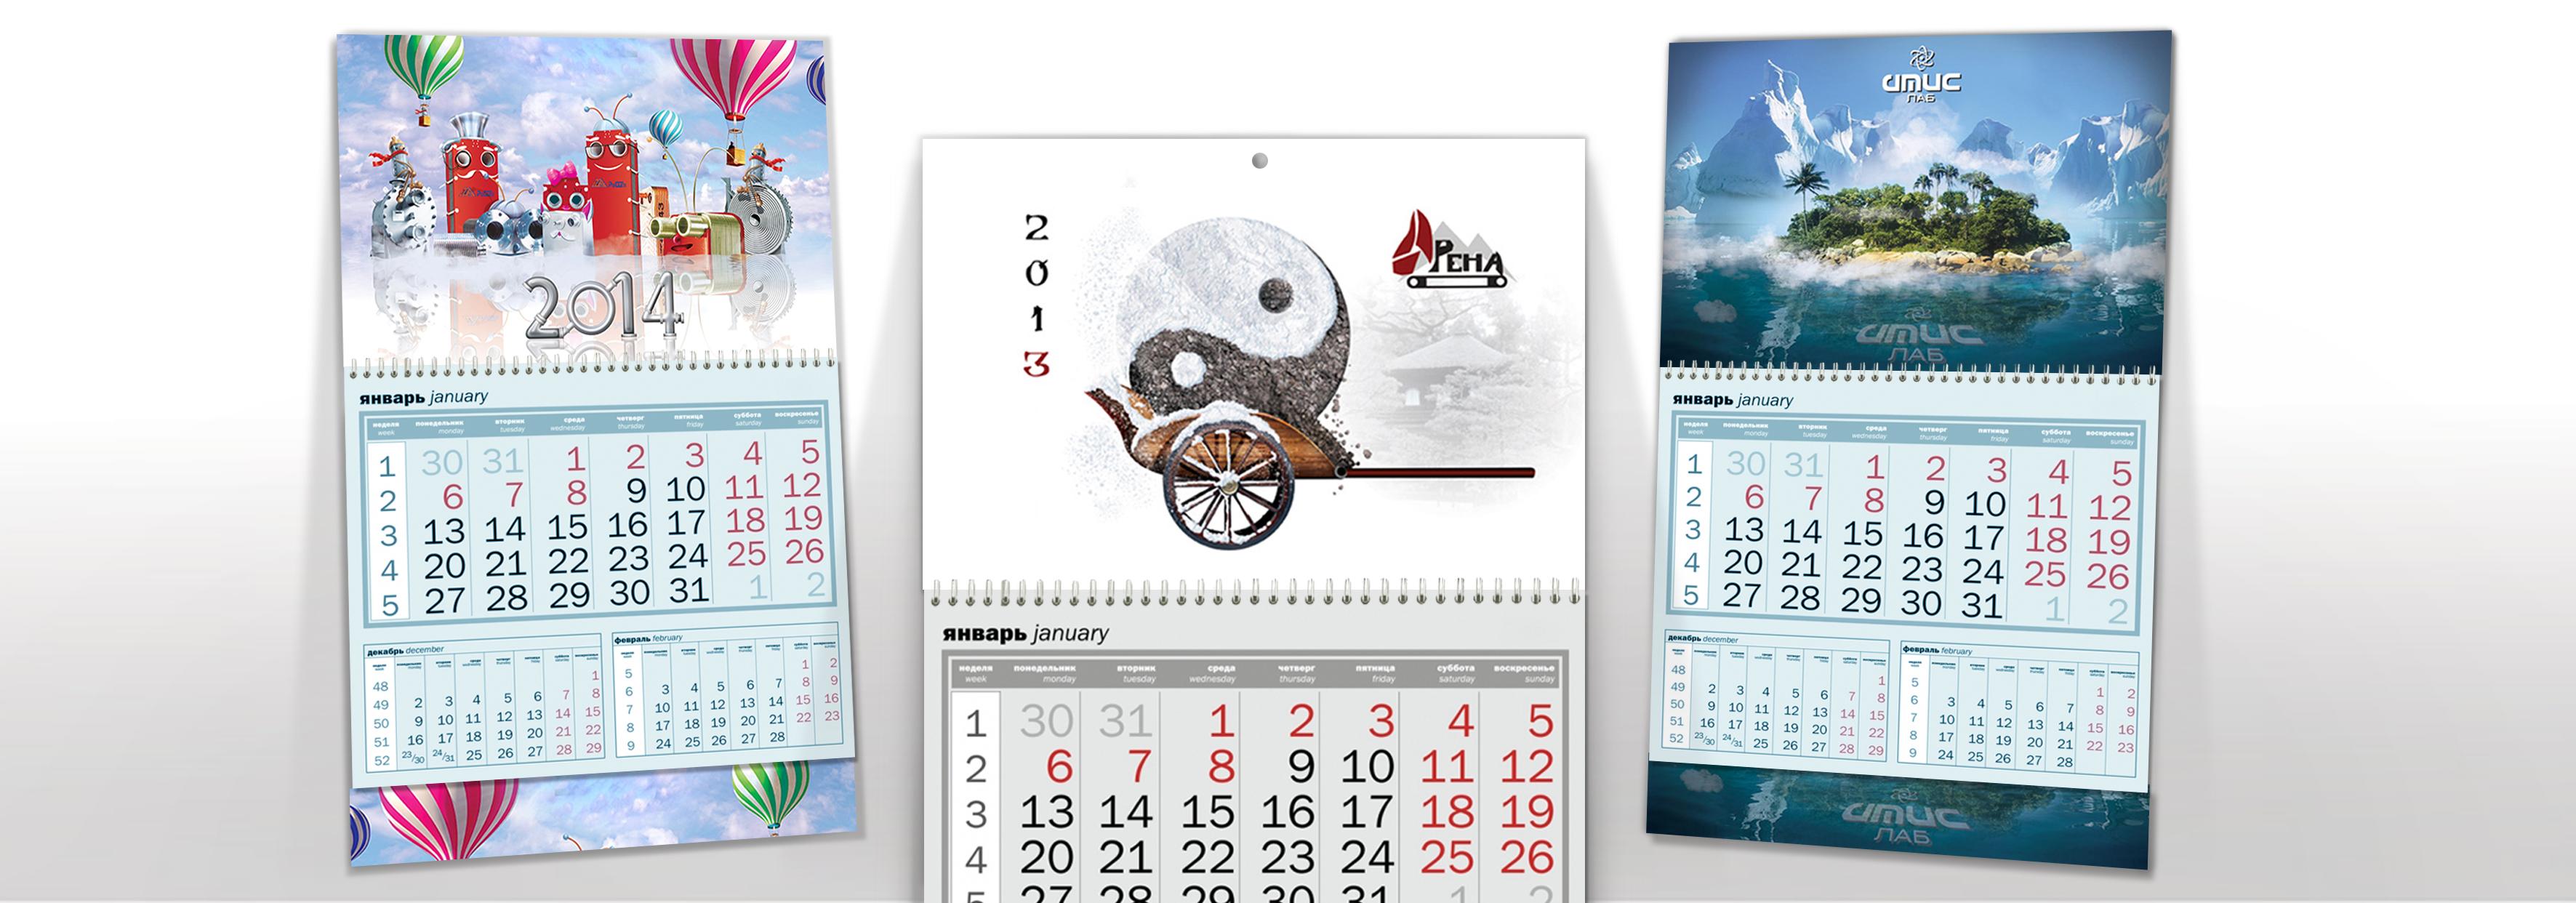 kalendari-short